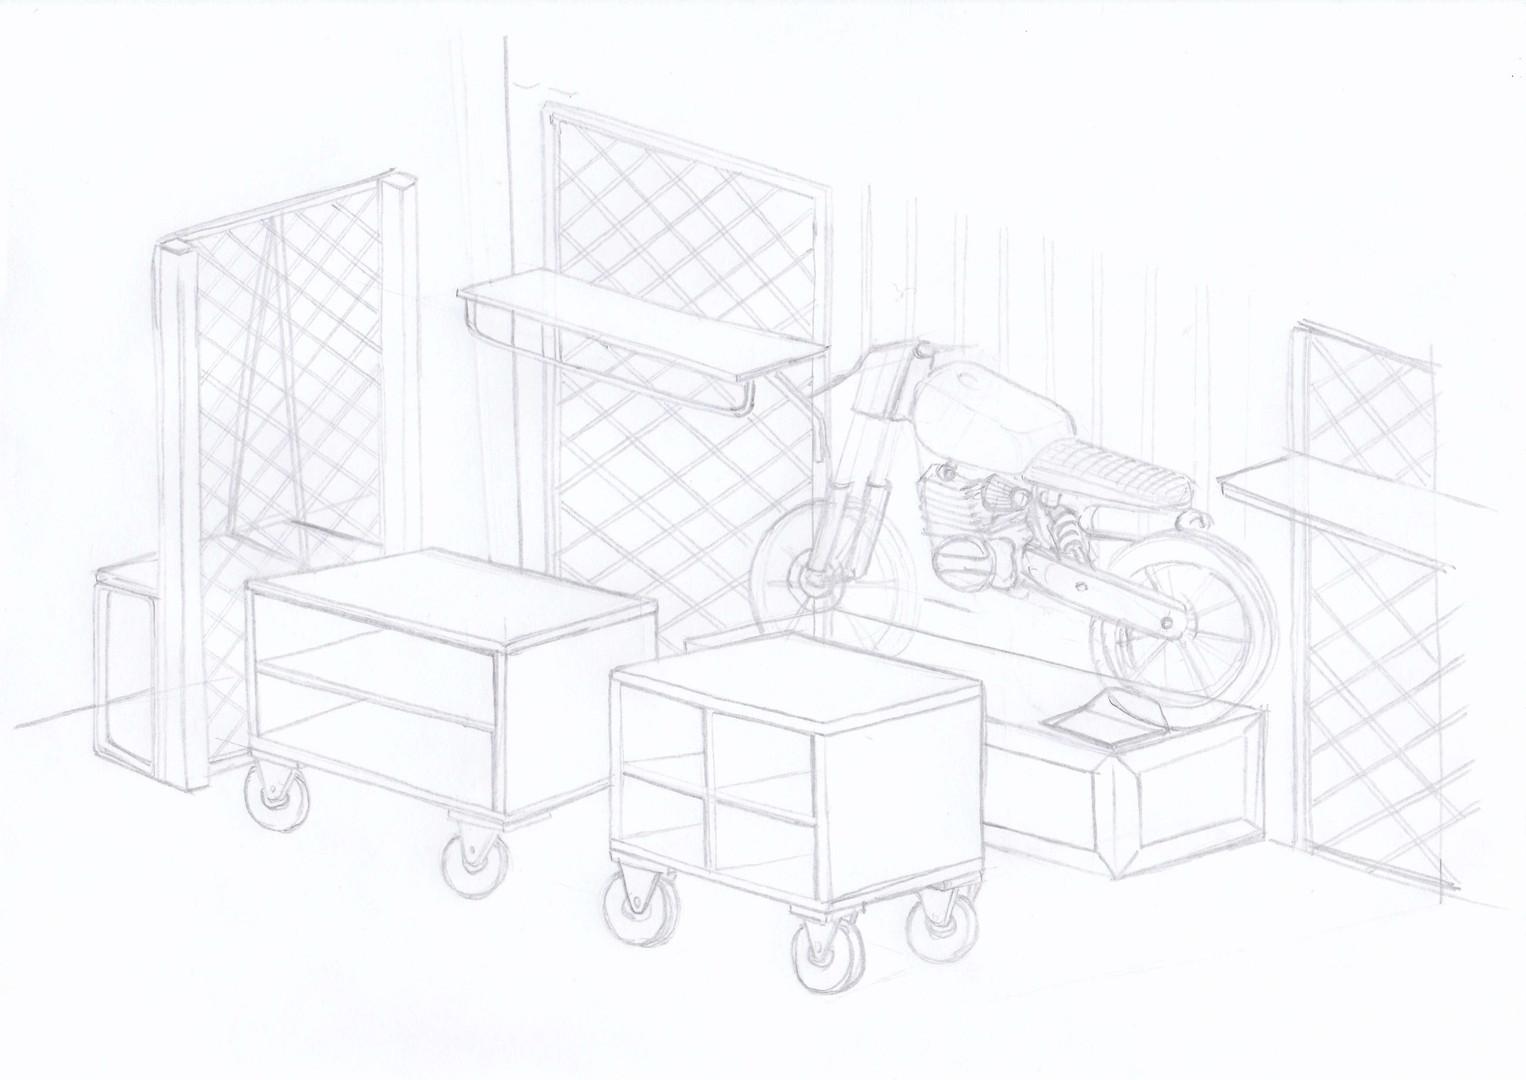 C2 Sketch 3Q.jpg